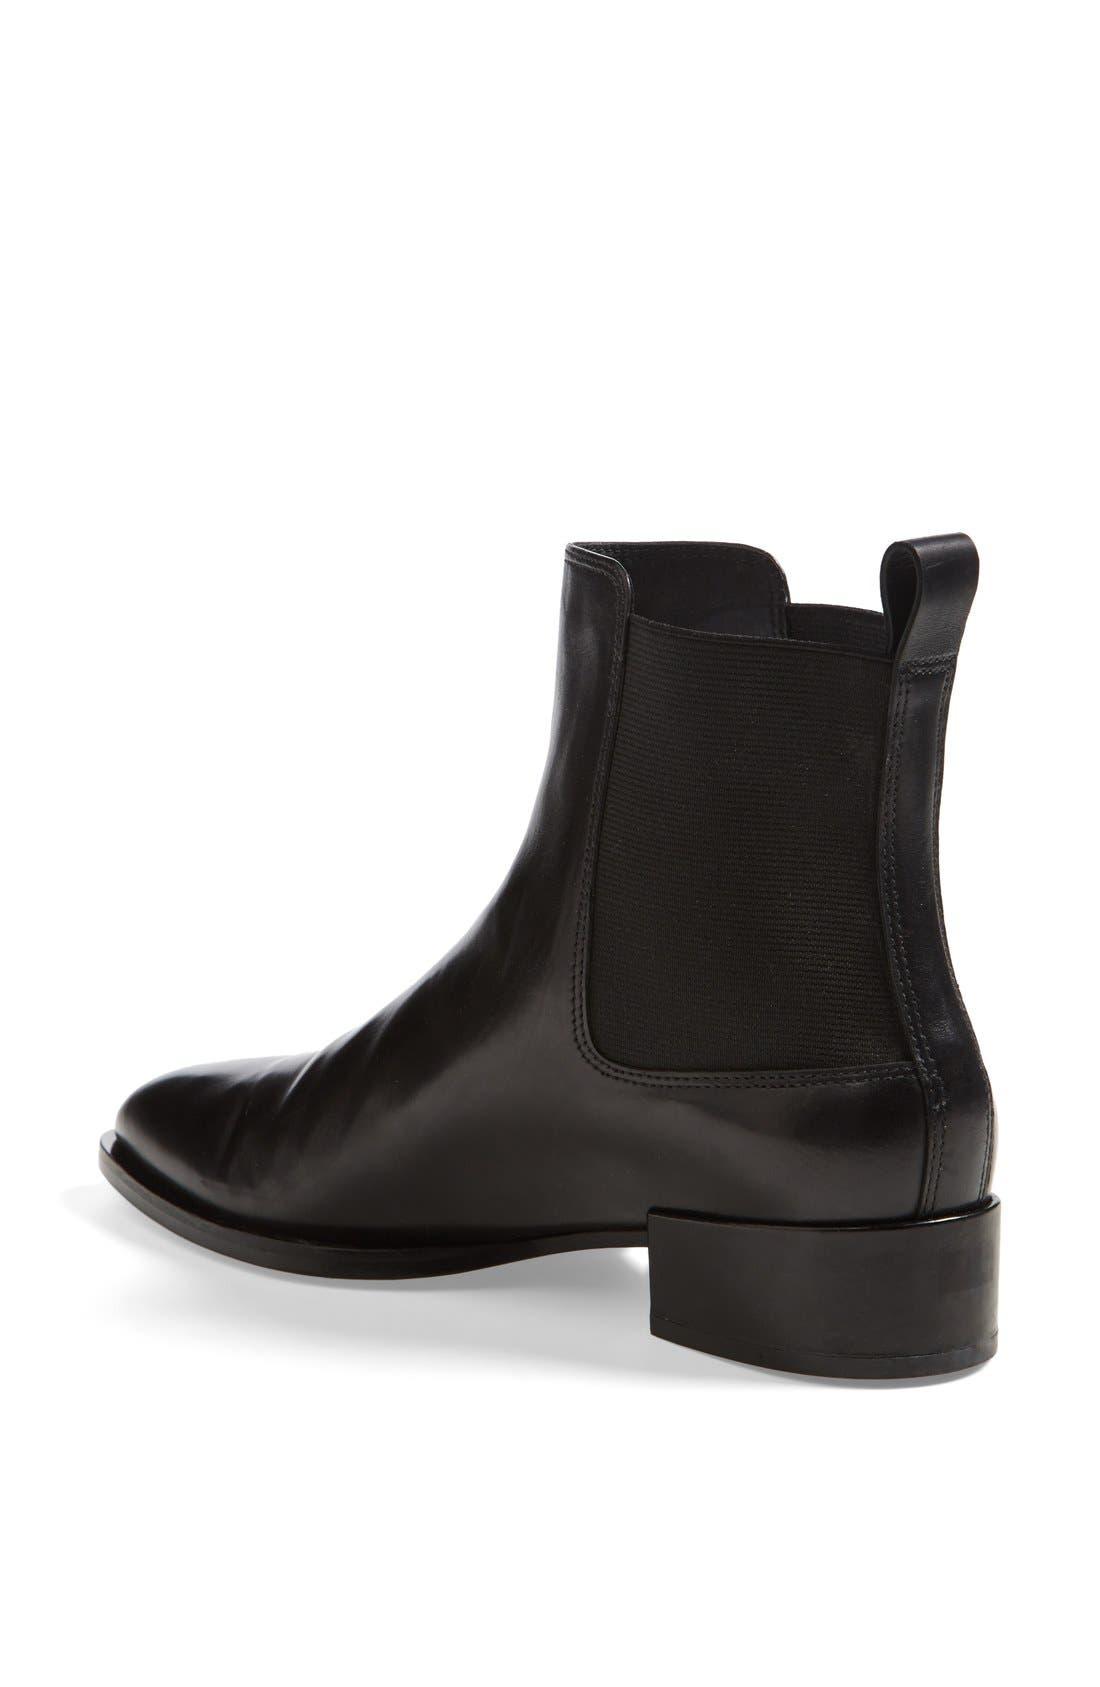 'Yarmon' Almond Toe Calfskin Leather Chelsea Boot,                             Alternate thumbnail 3, color,                             002